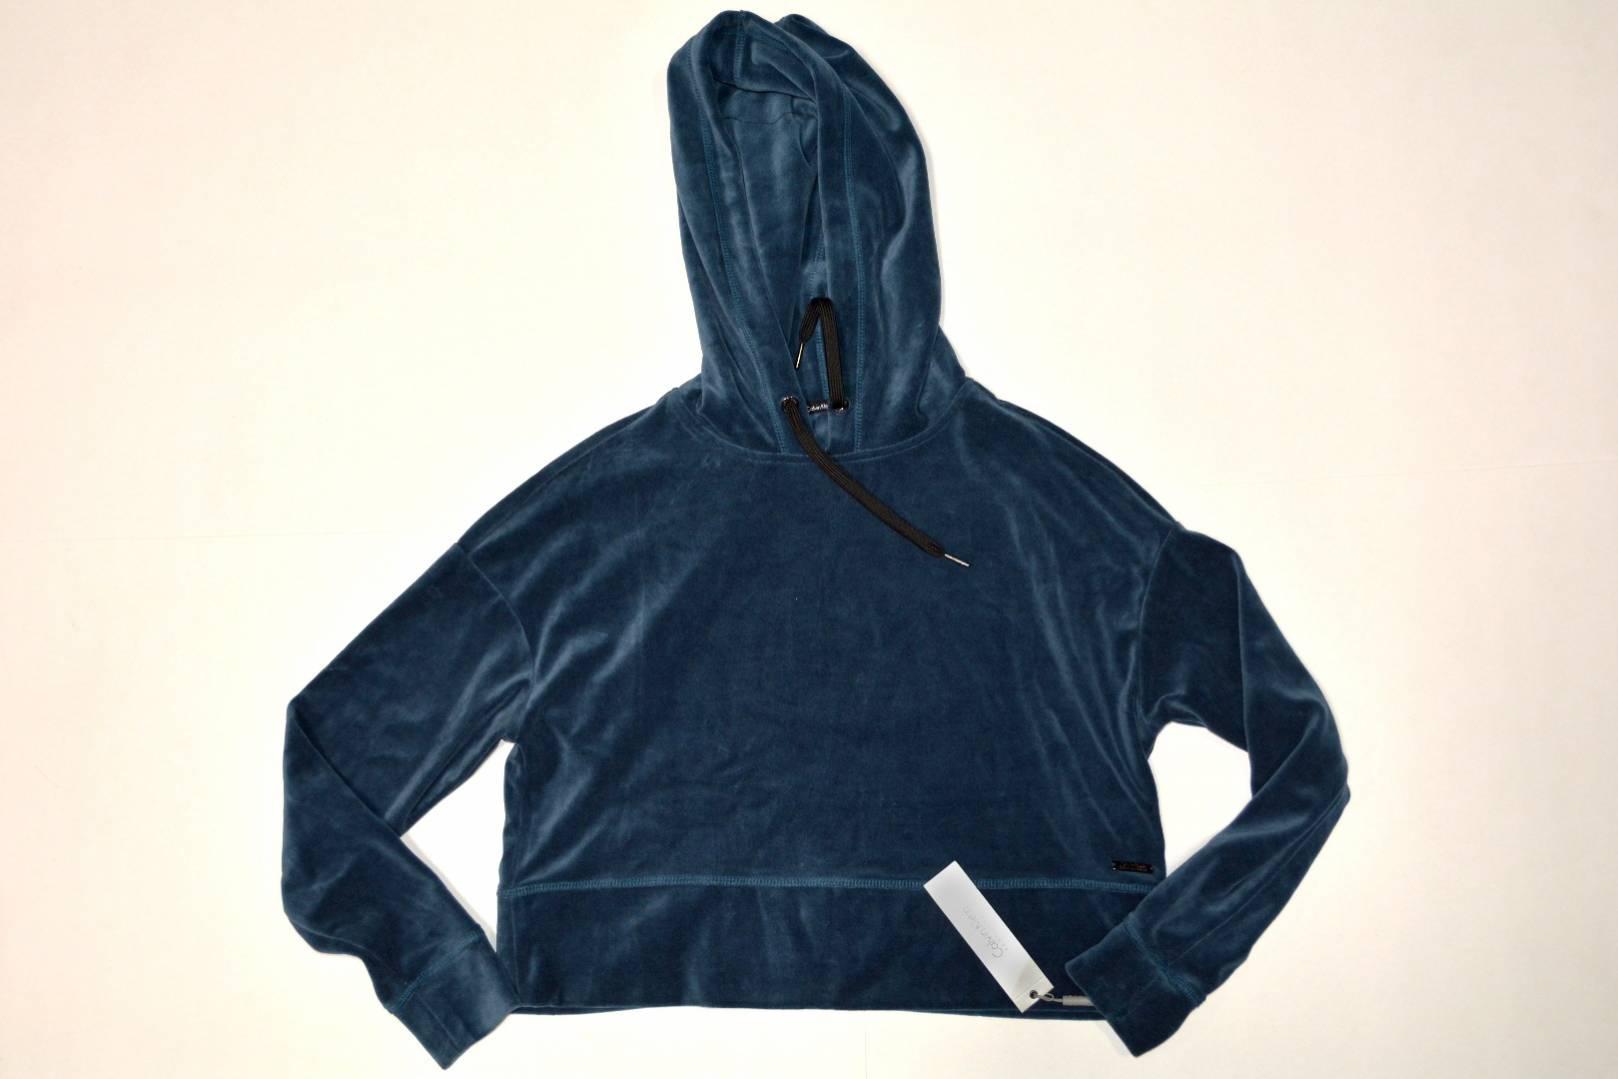 549ade0e Via Trading | HE Department Store Shelf-Pull Women's Activewear Lots